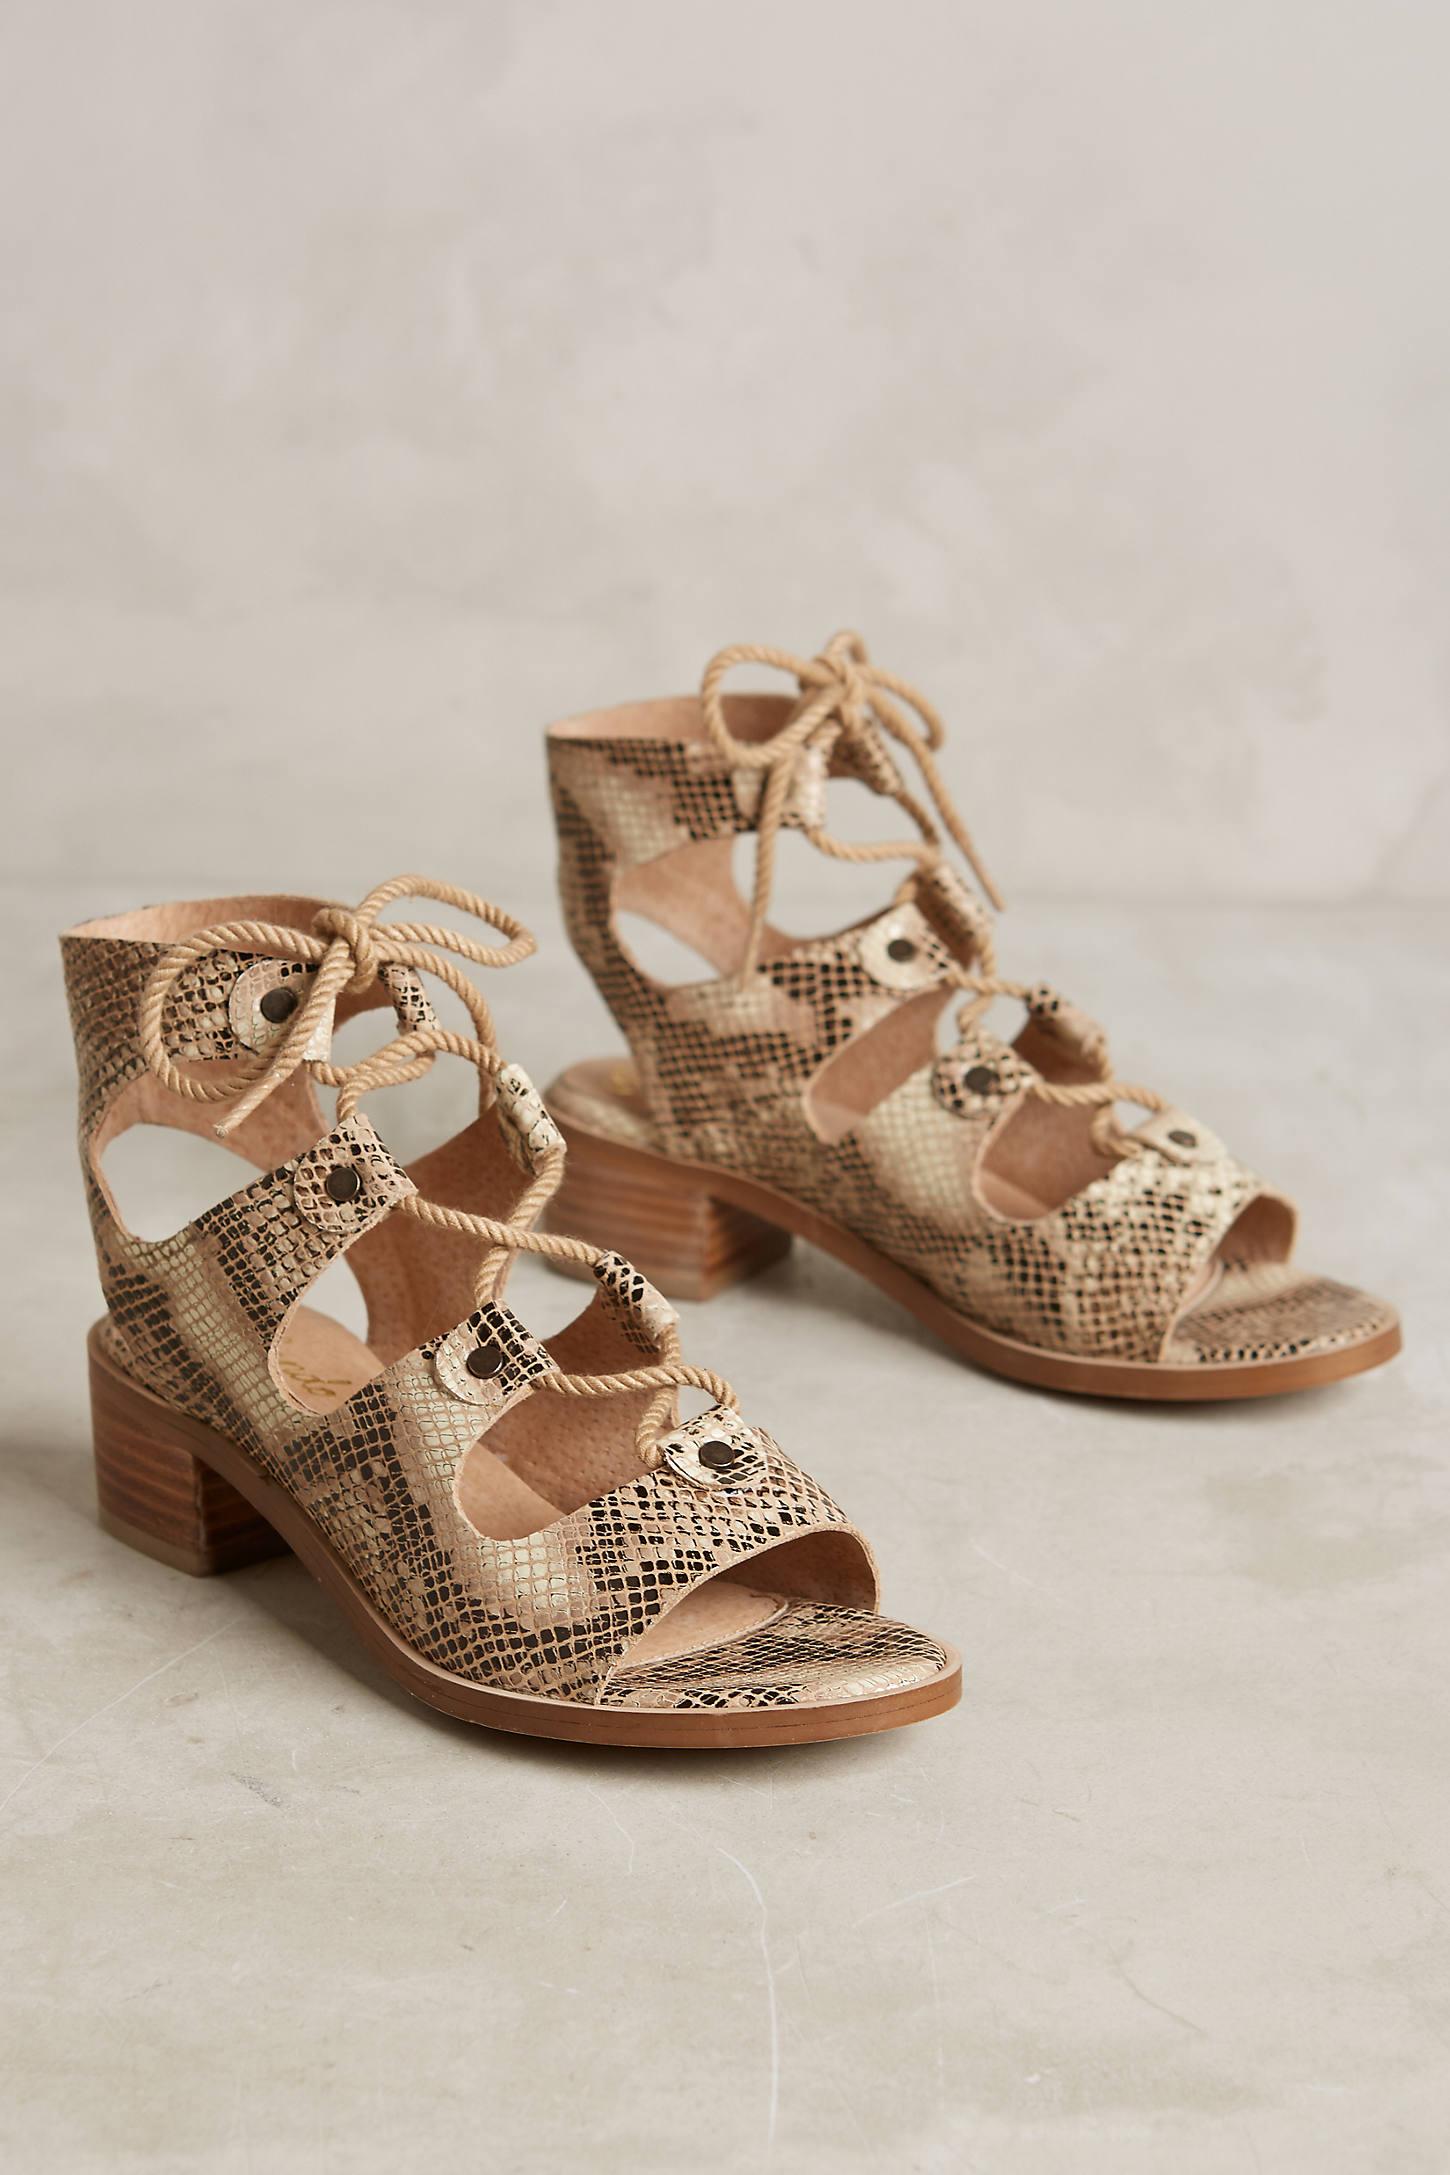 Lien. Do Marbella Lace-Up Sandals